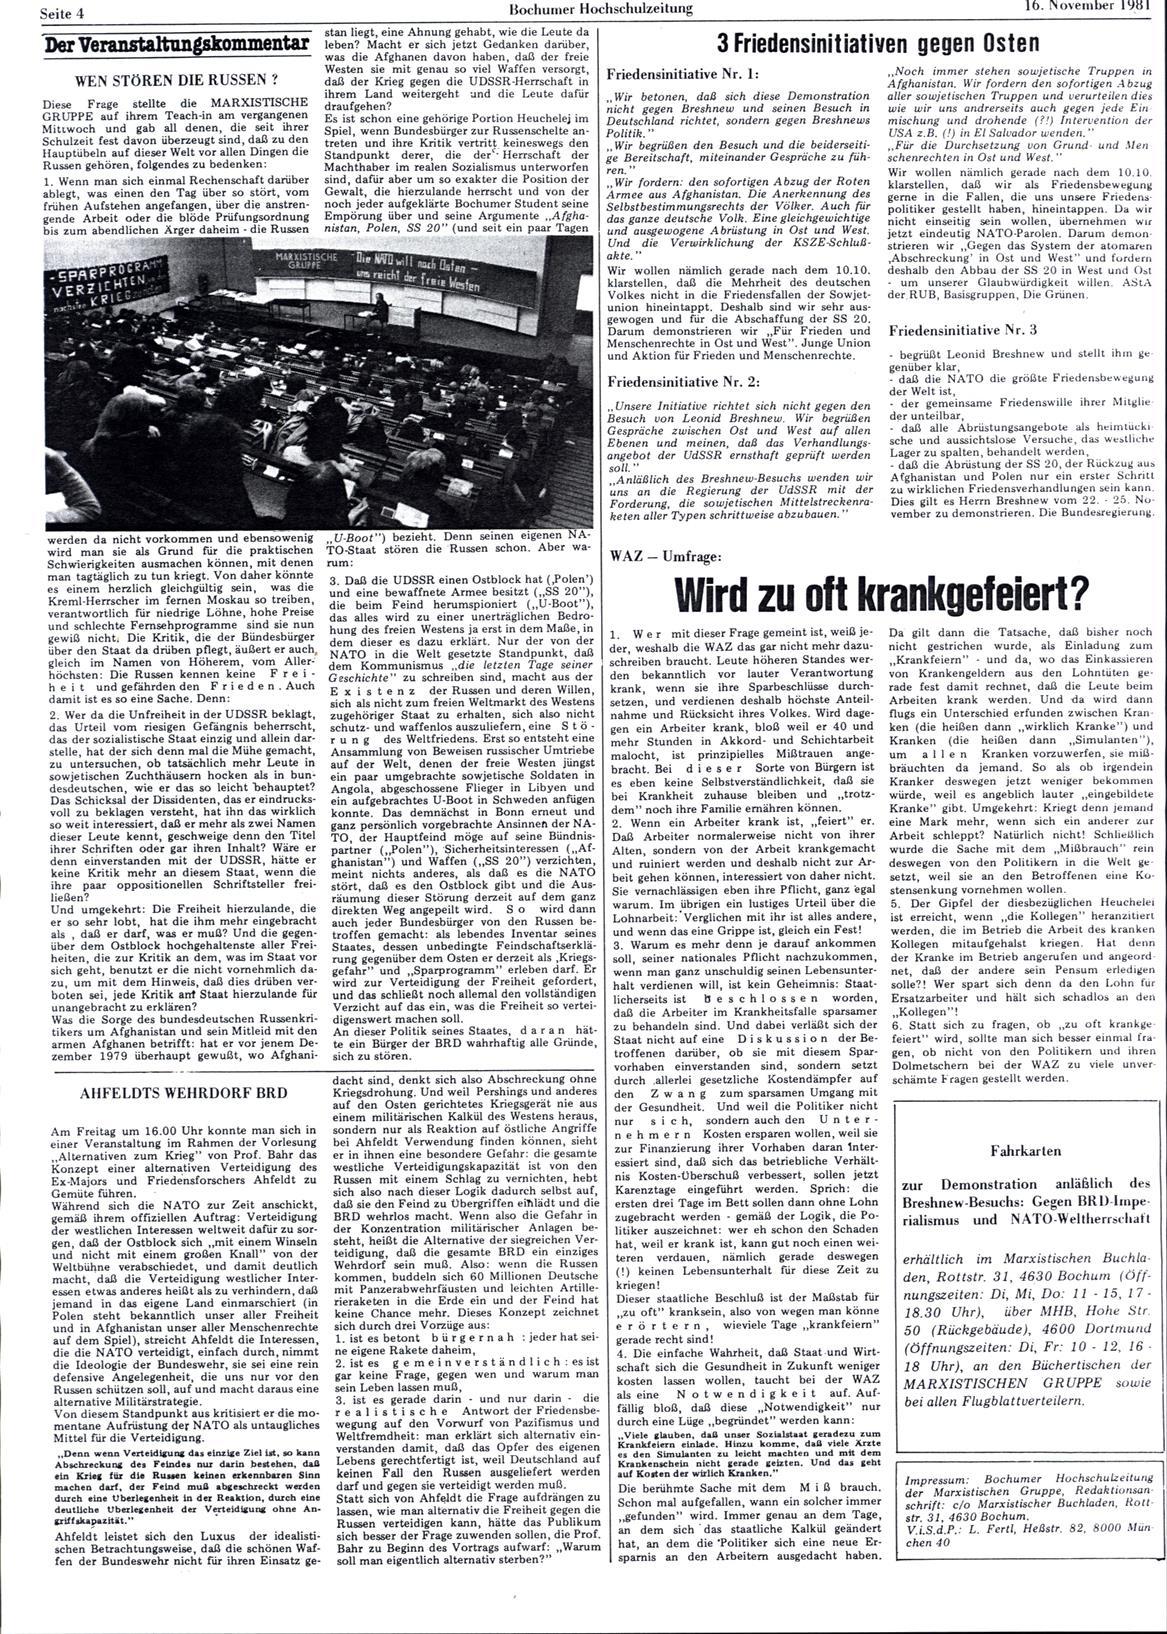 Bochum_BHZ_19811116_040_004